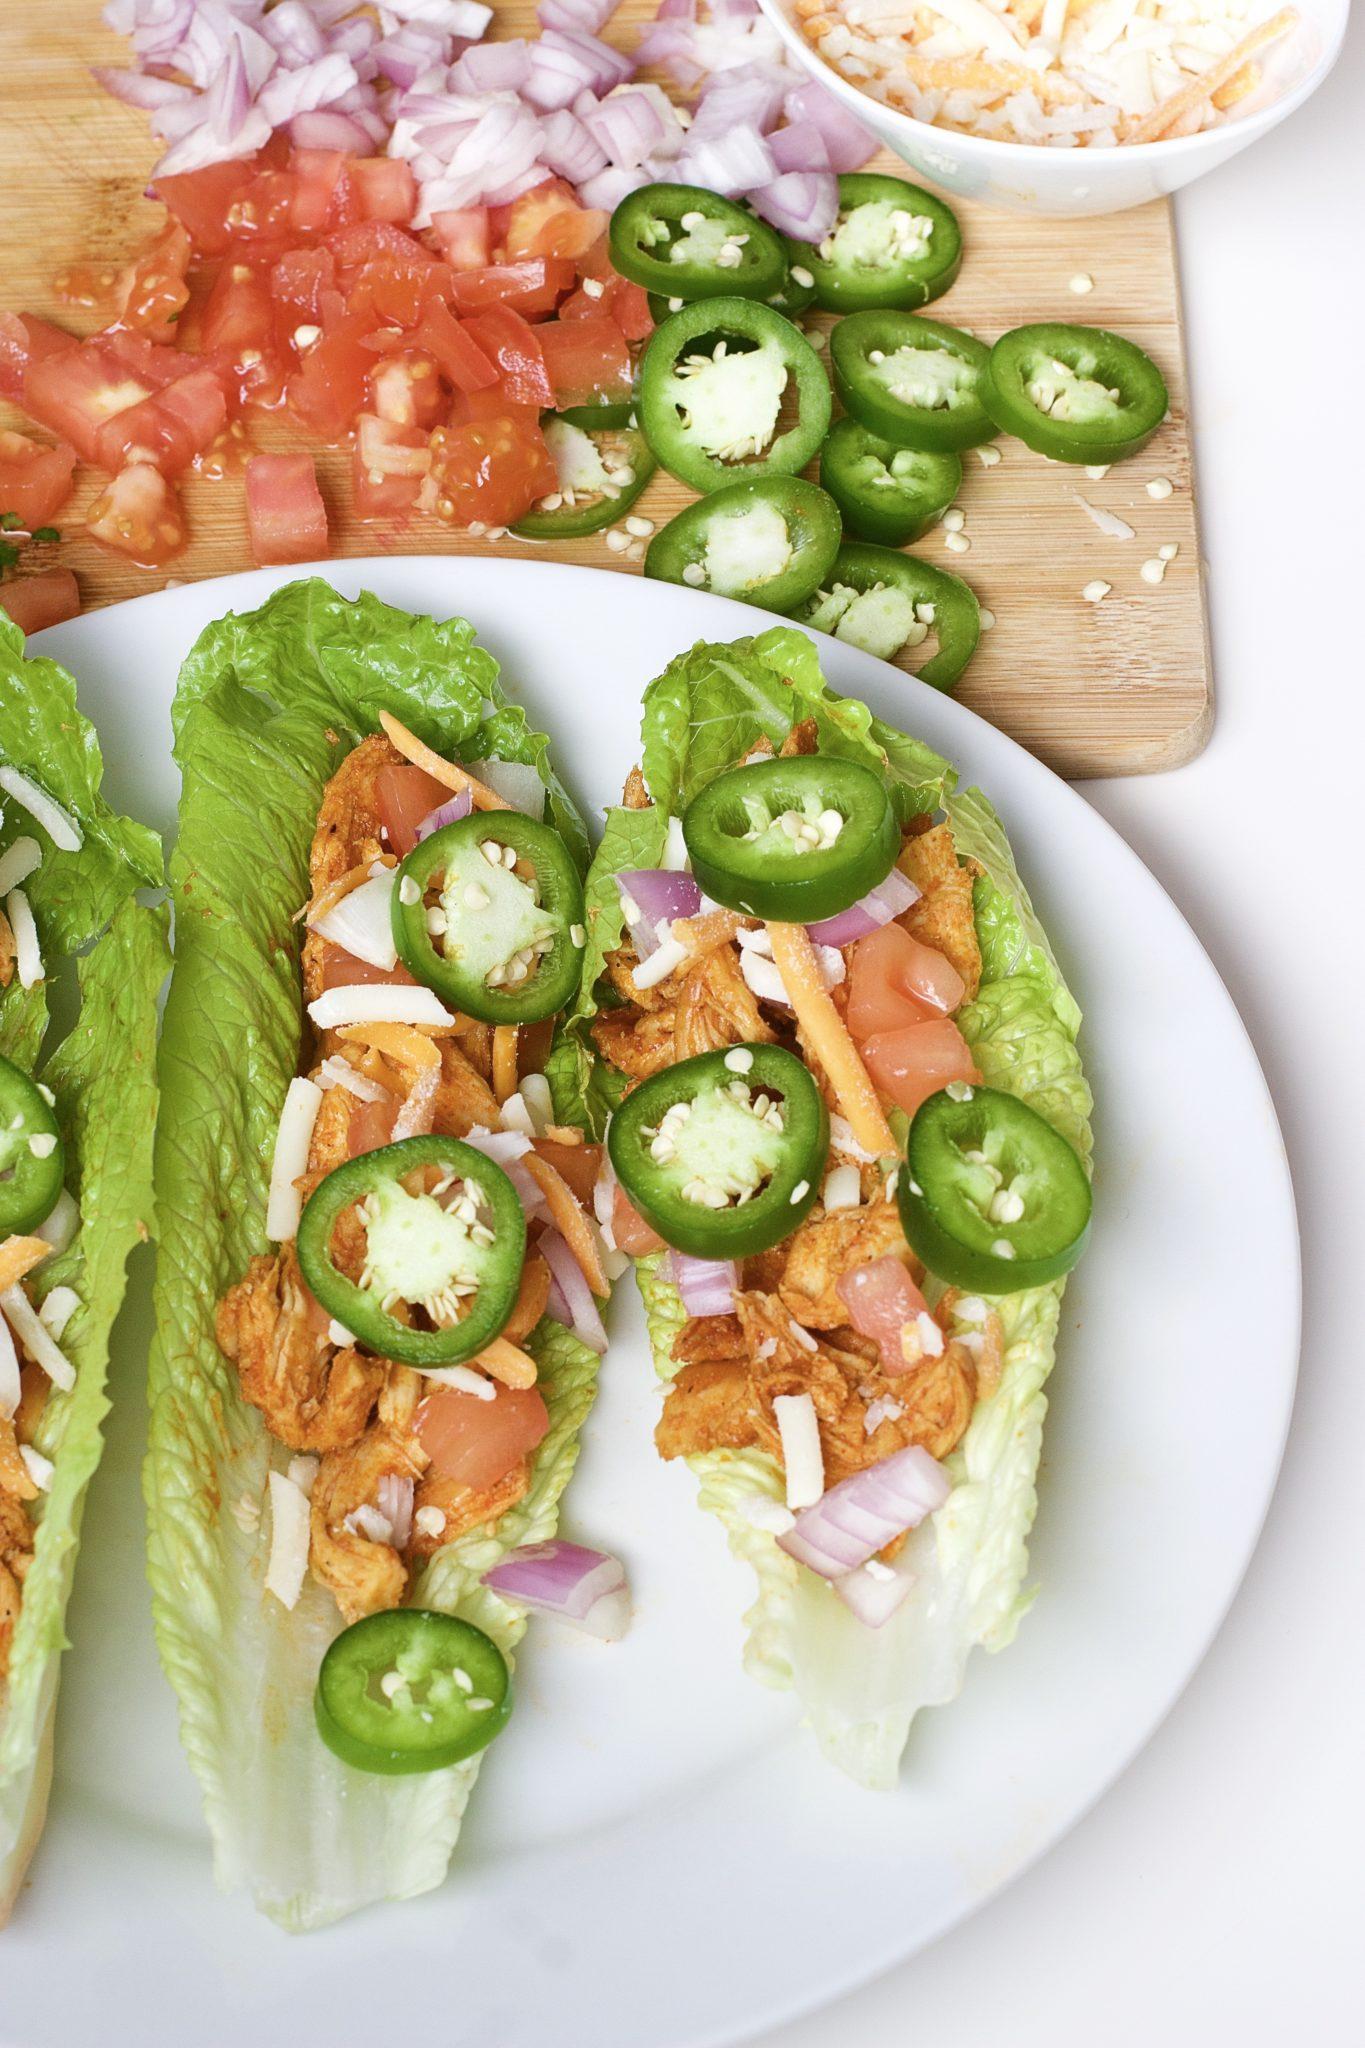 Buffalo Chicken Lettuce Tacos (Gluten-Free, Paleo)